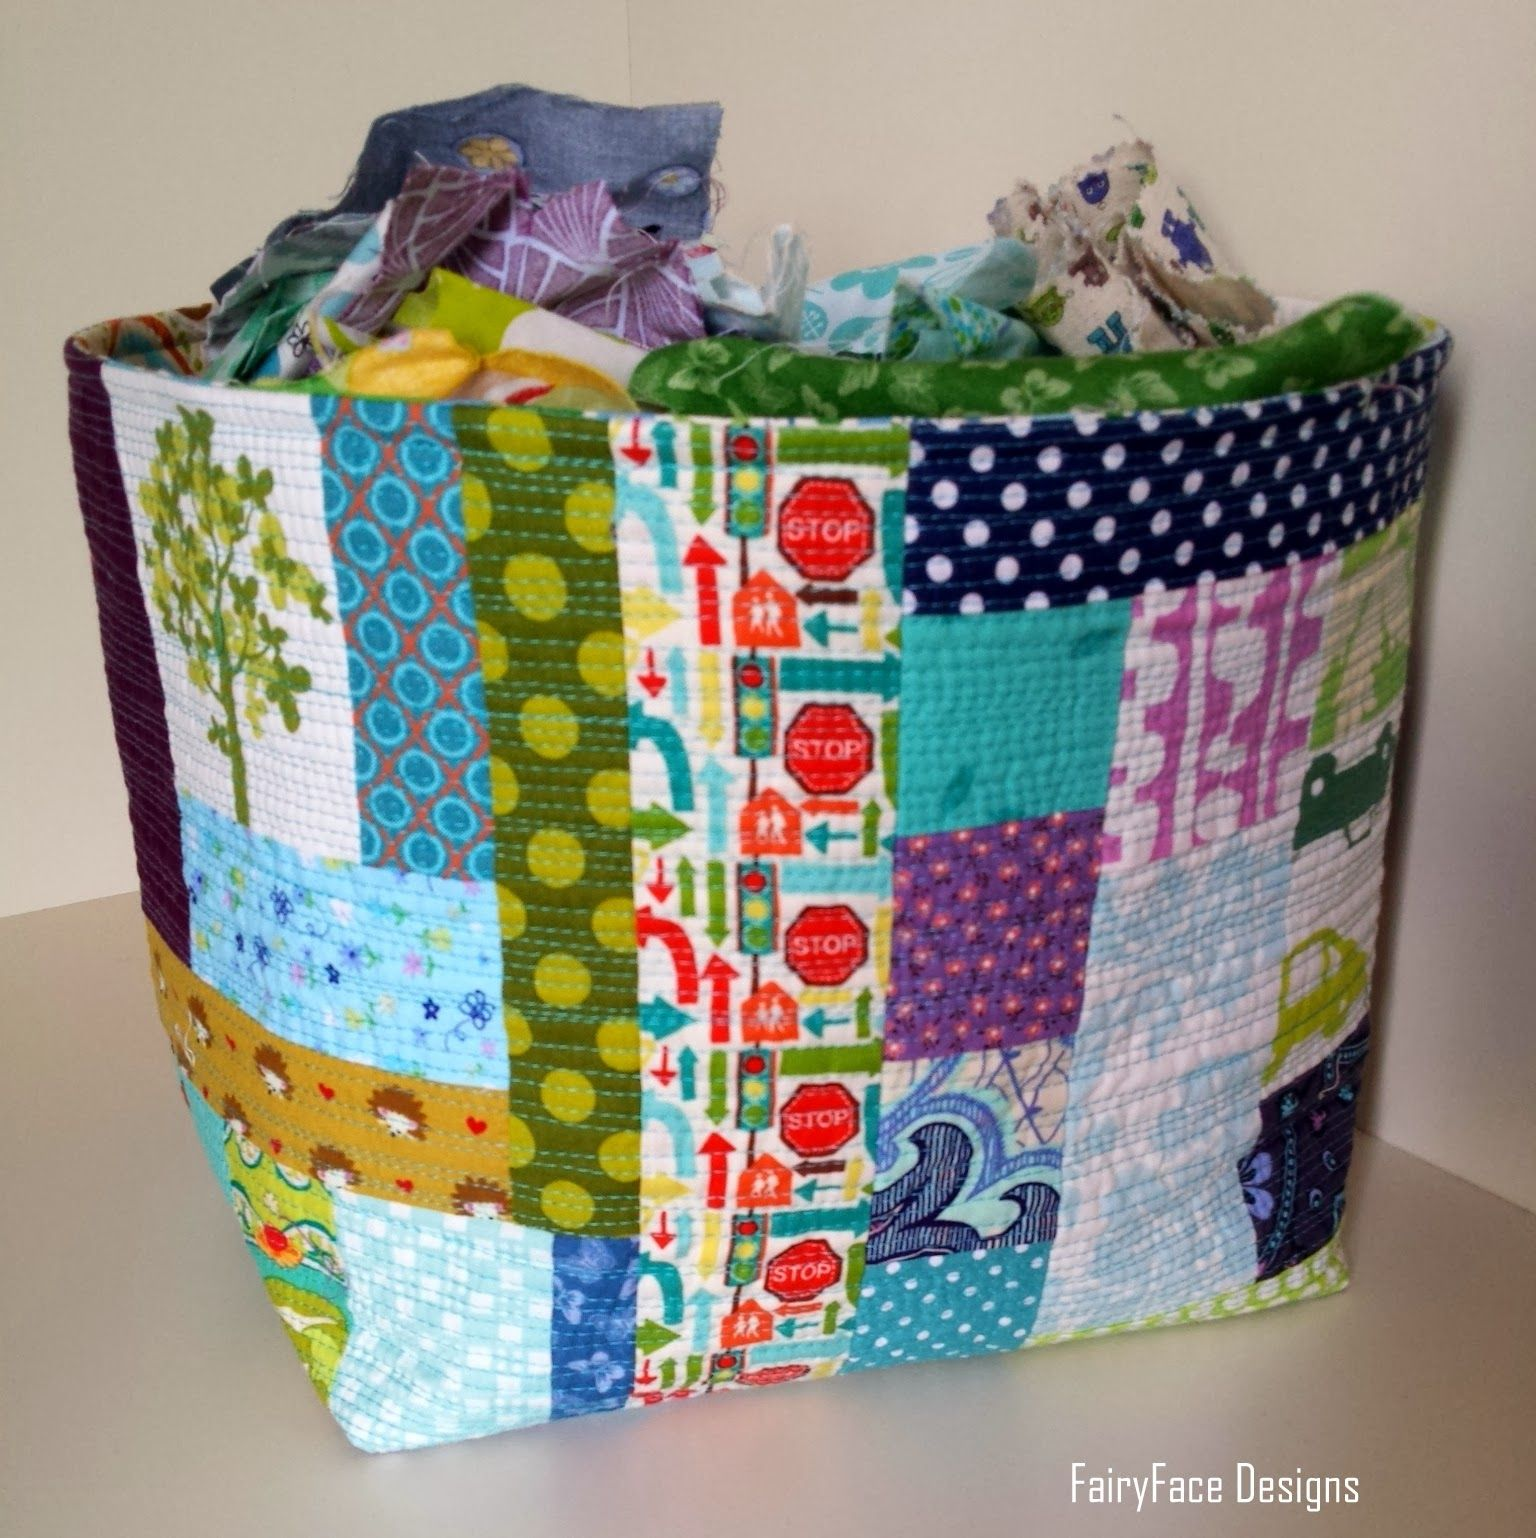 FairyFace Designs: Great big scrappy fabric basket